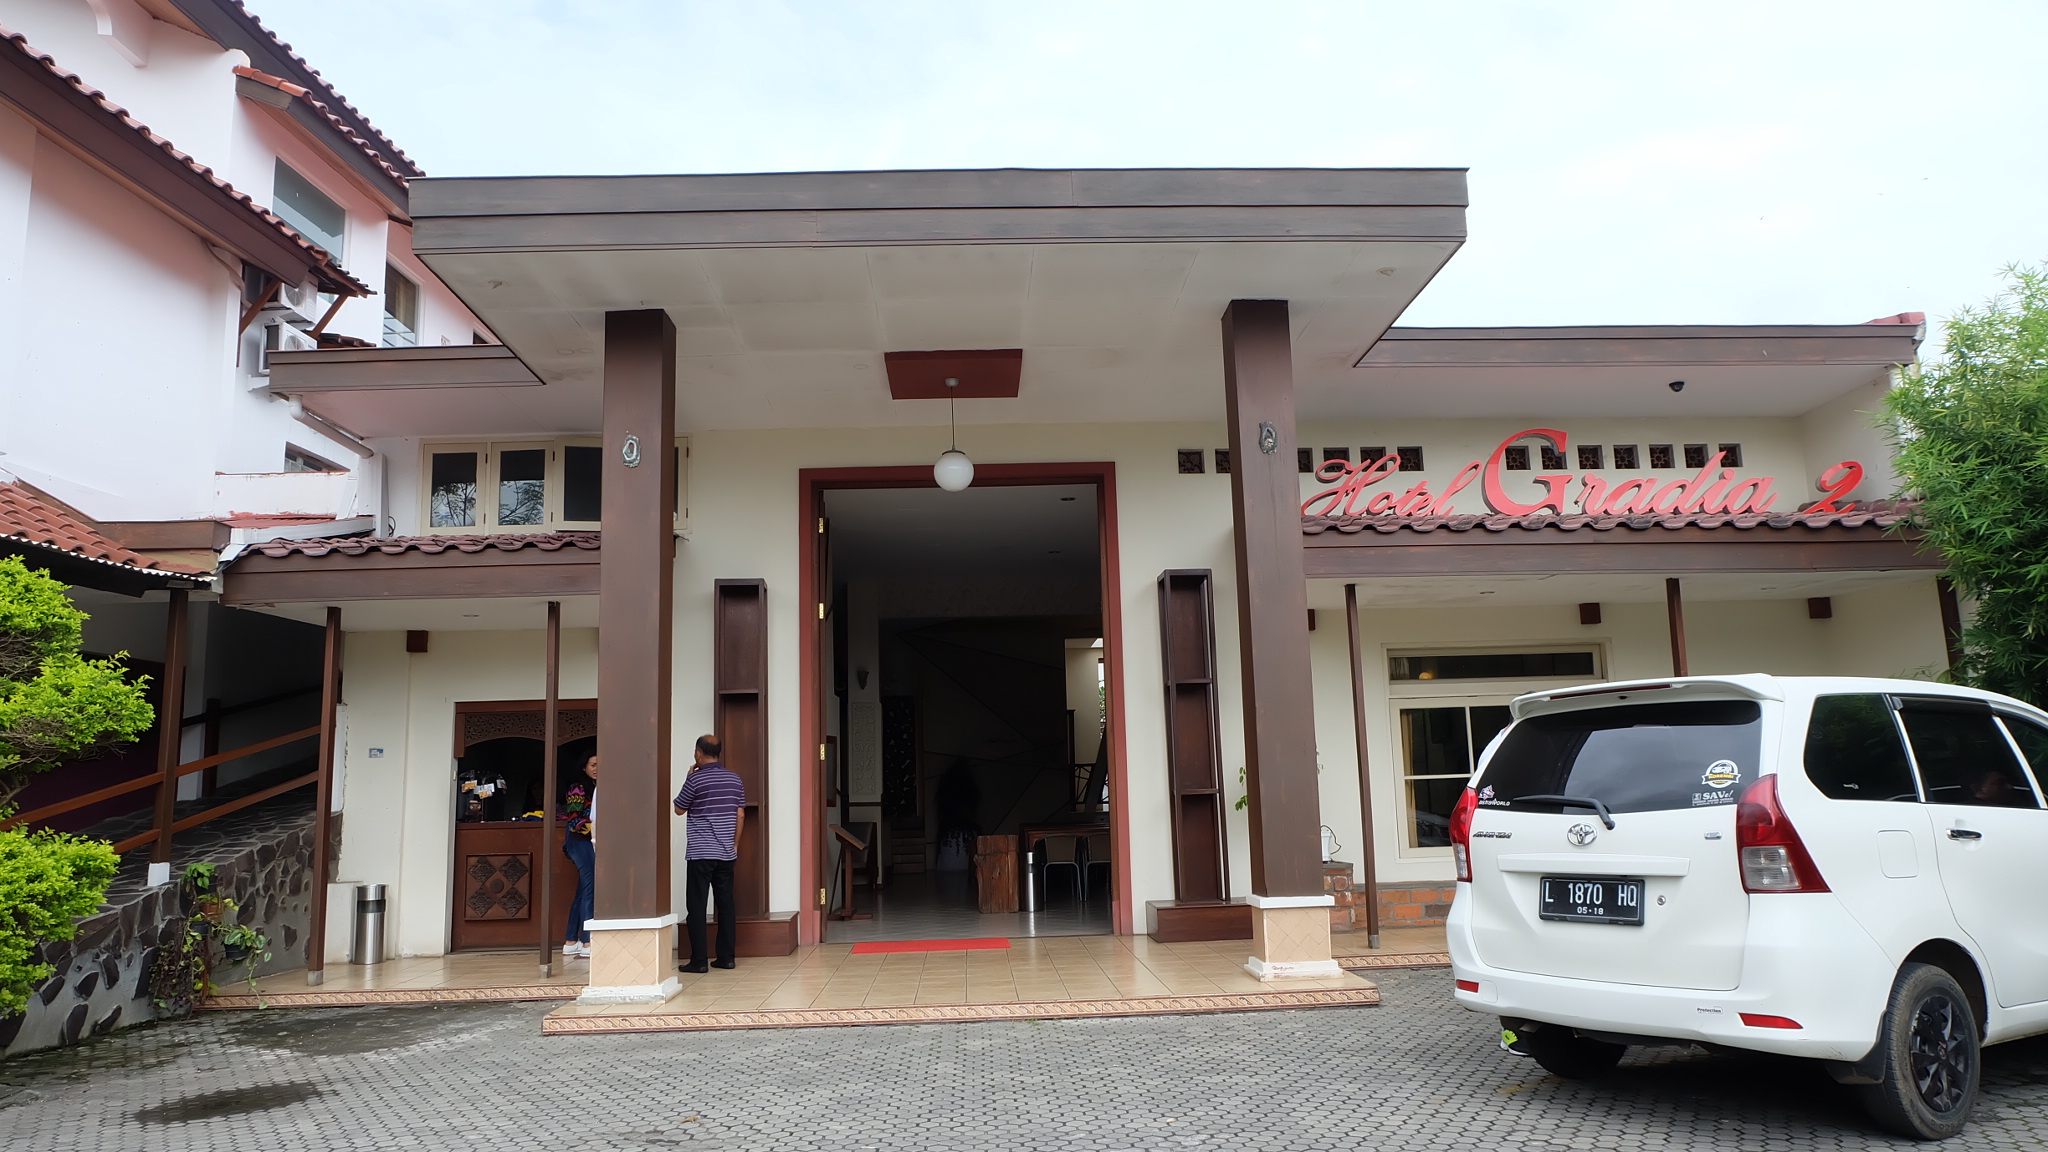 4 Hari Liburan di Jawa Timur (Batu) Part 3